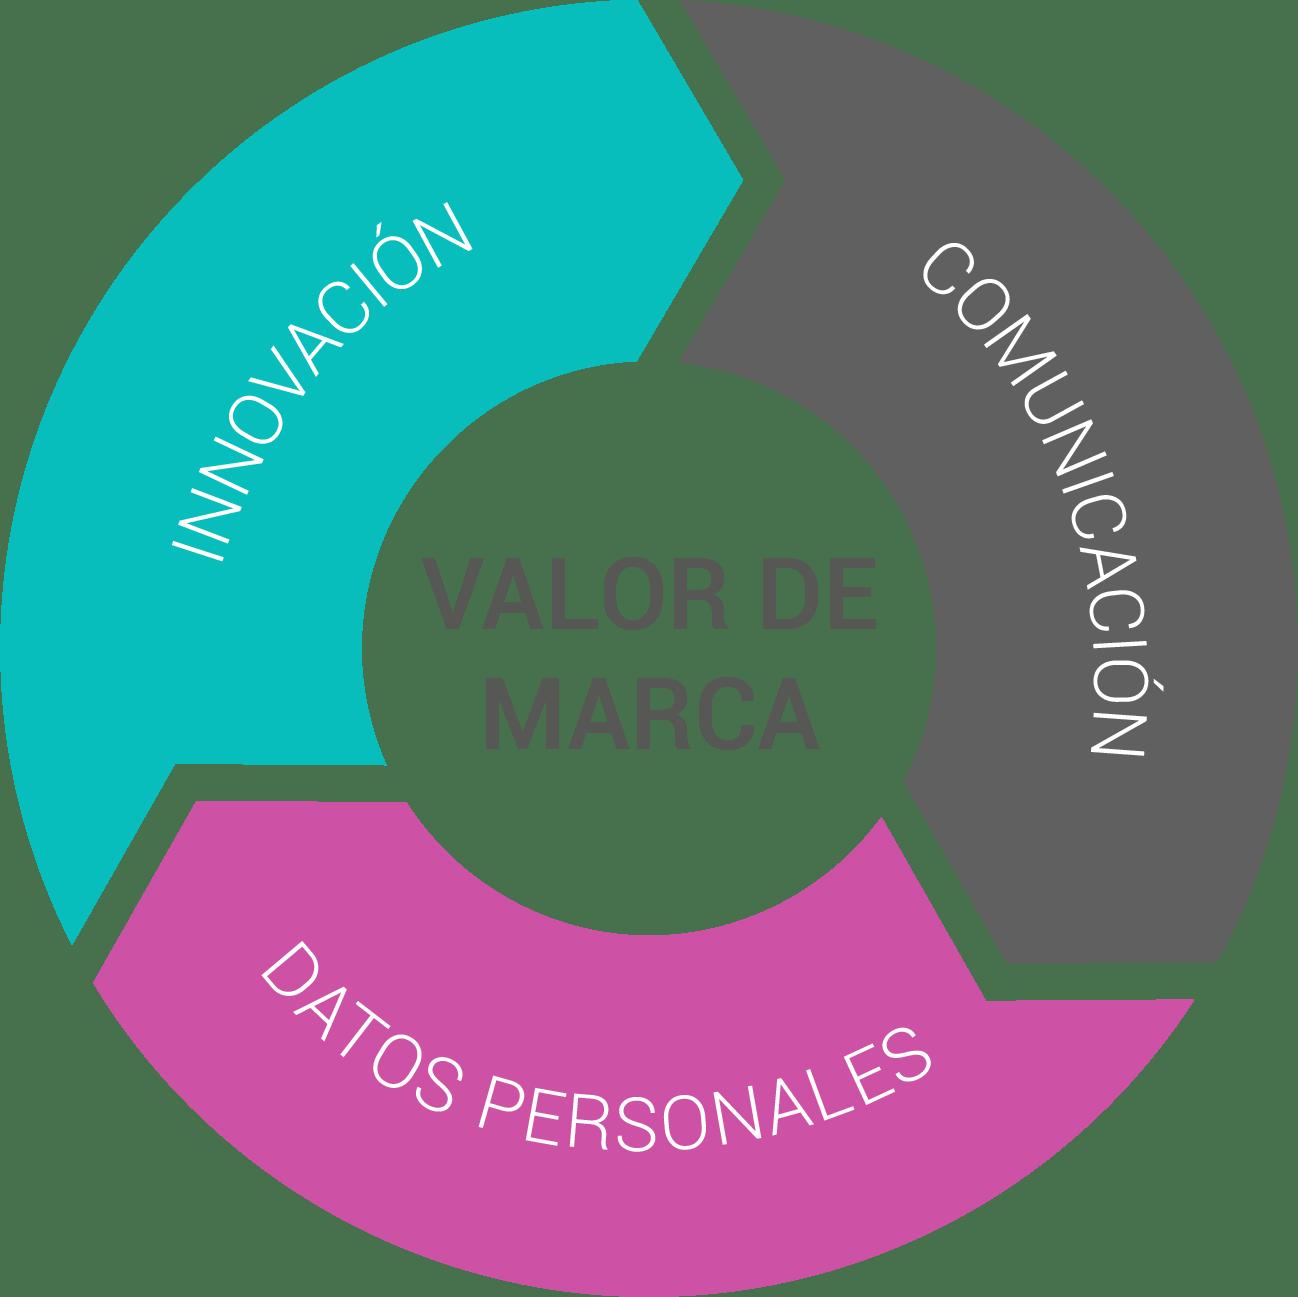 Valor de marca